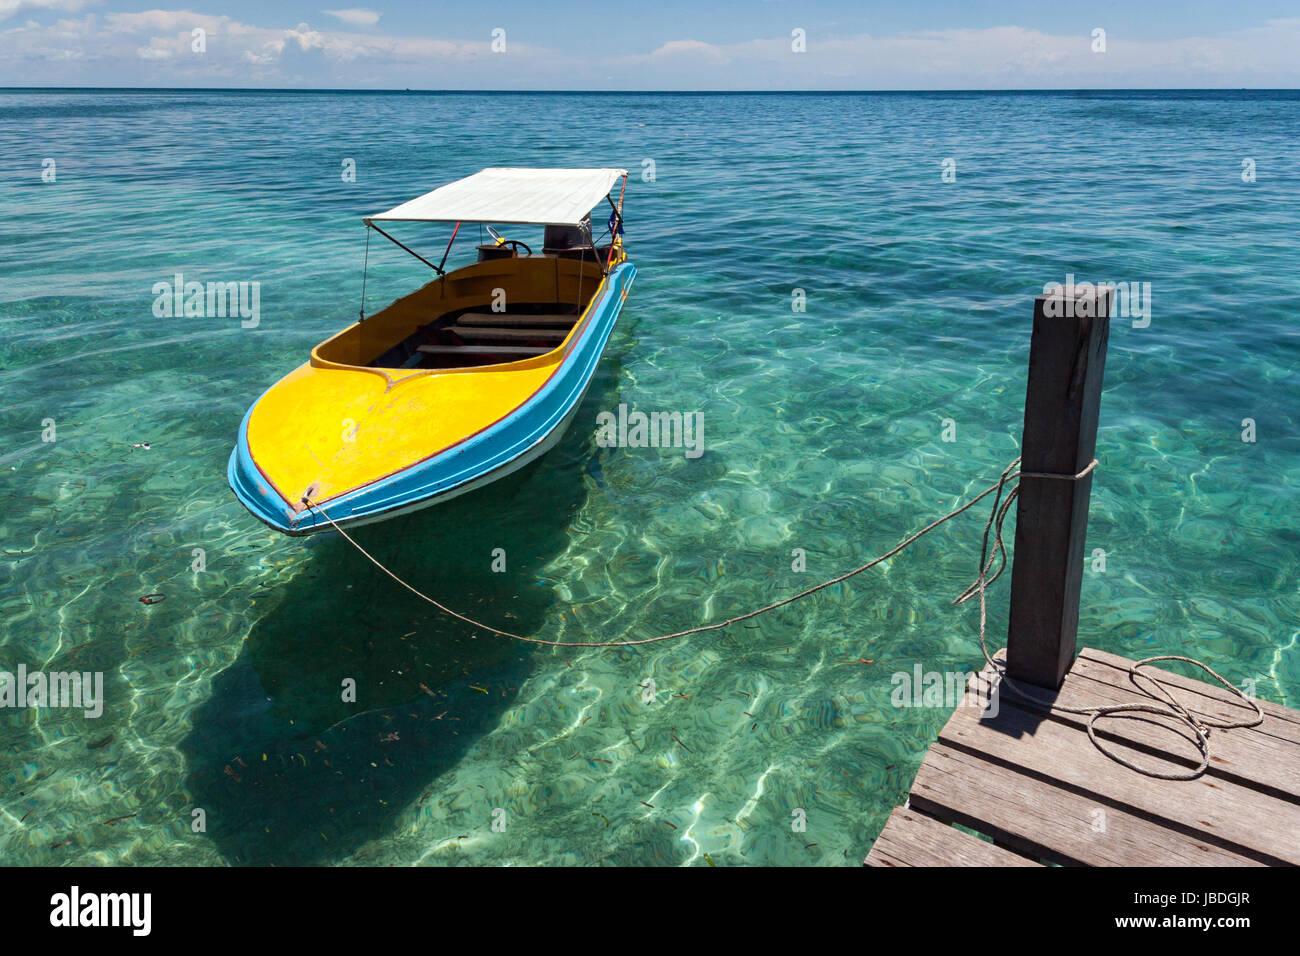 SIPADAN ISLAND, BORNEO, MALAYSIA - Colourful boat floating in calm crystal clear water. Stock Photo